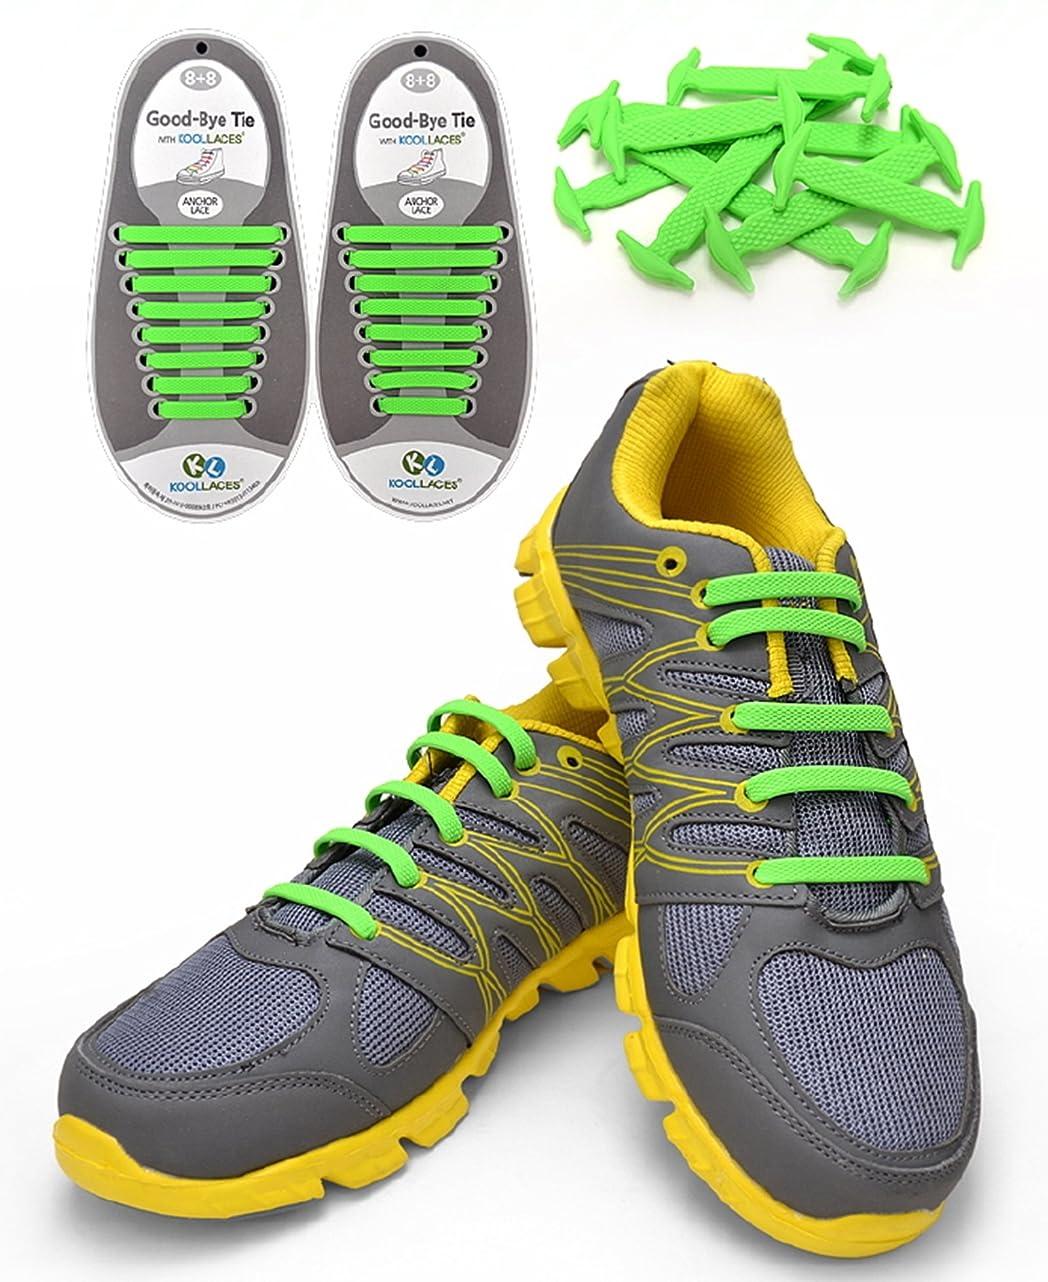 Koollaces No Tie Elastic Slip on Silicone Shoelaces,hook Type,2set=16 Pcs (Green) rhy881365861783